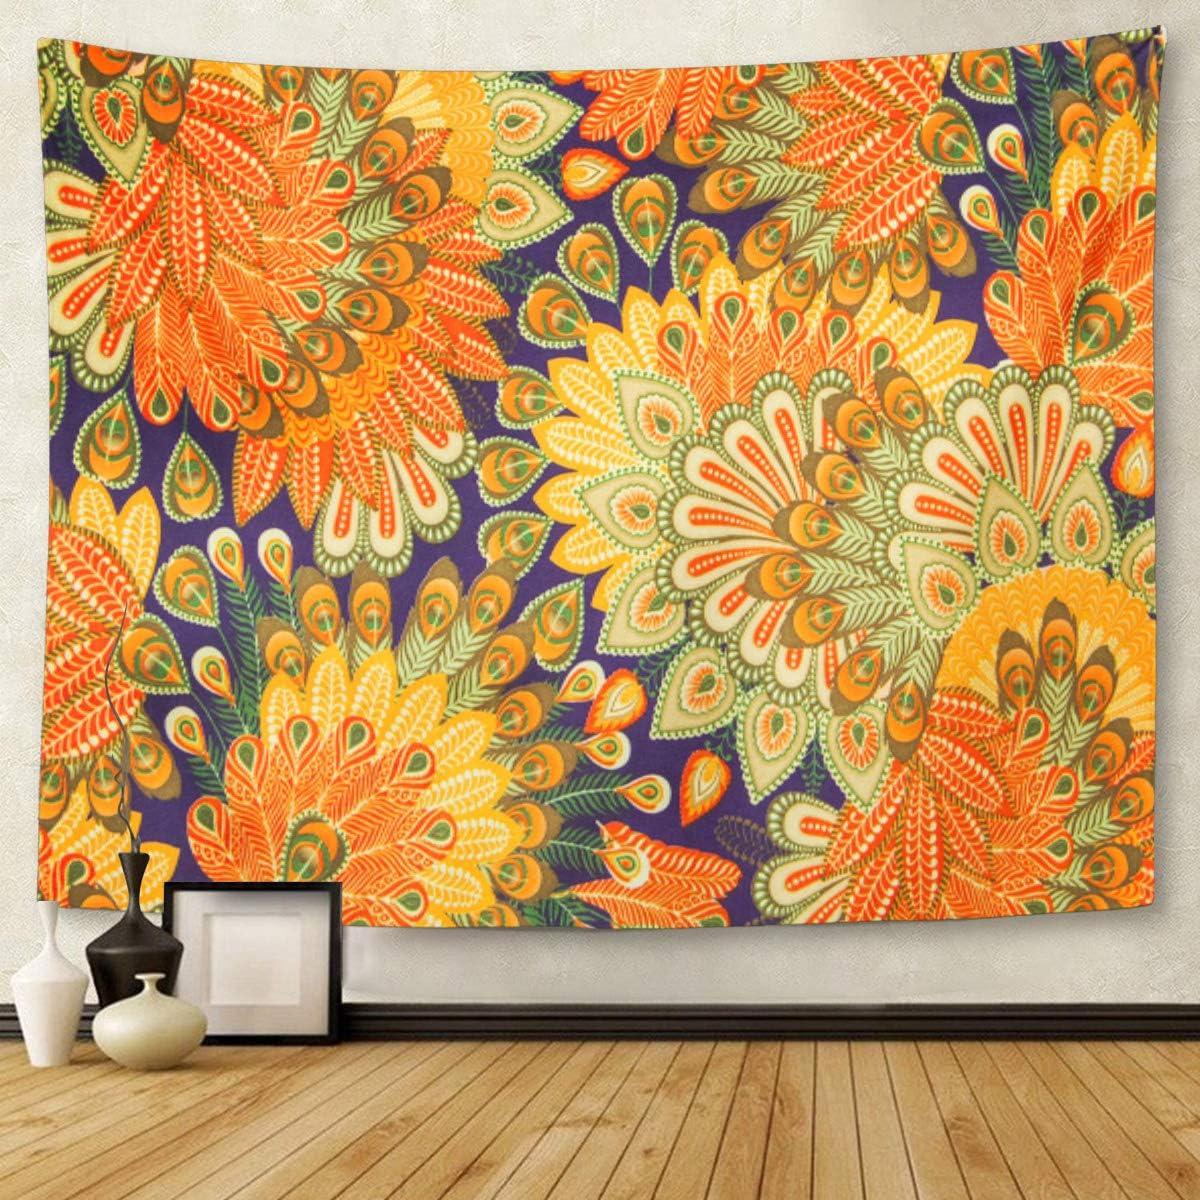 Amazon Com Emvency Tapestry Artwork Wall Hanging Orange 1970s